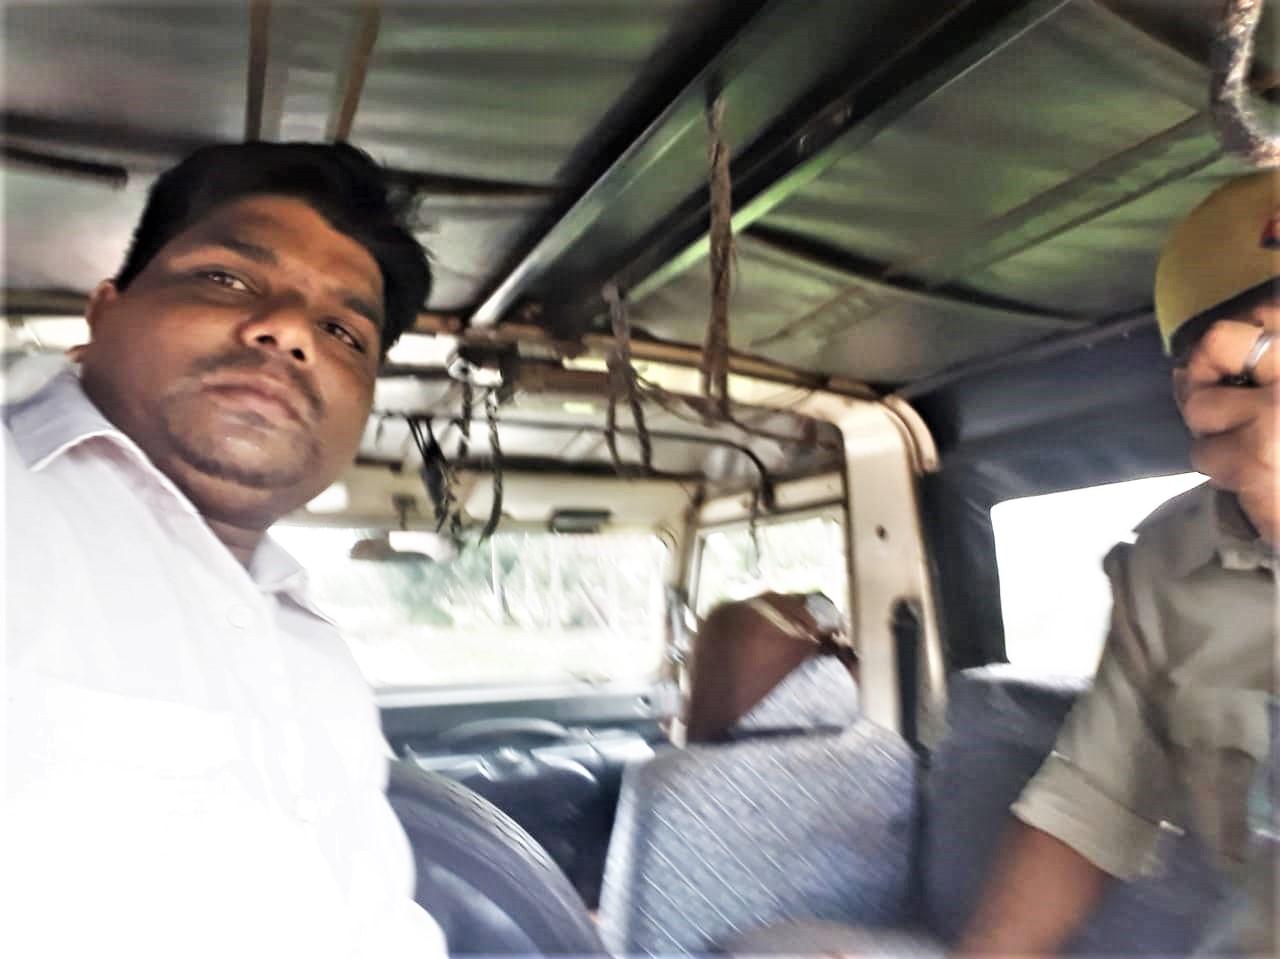 Pastor Biswas Das as police take him into custody. (Morning Star News)